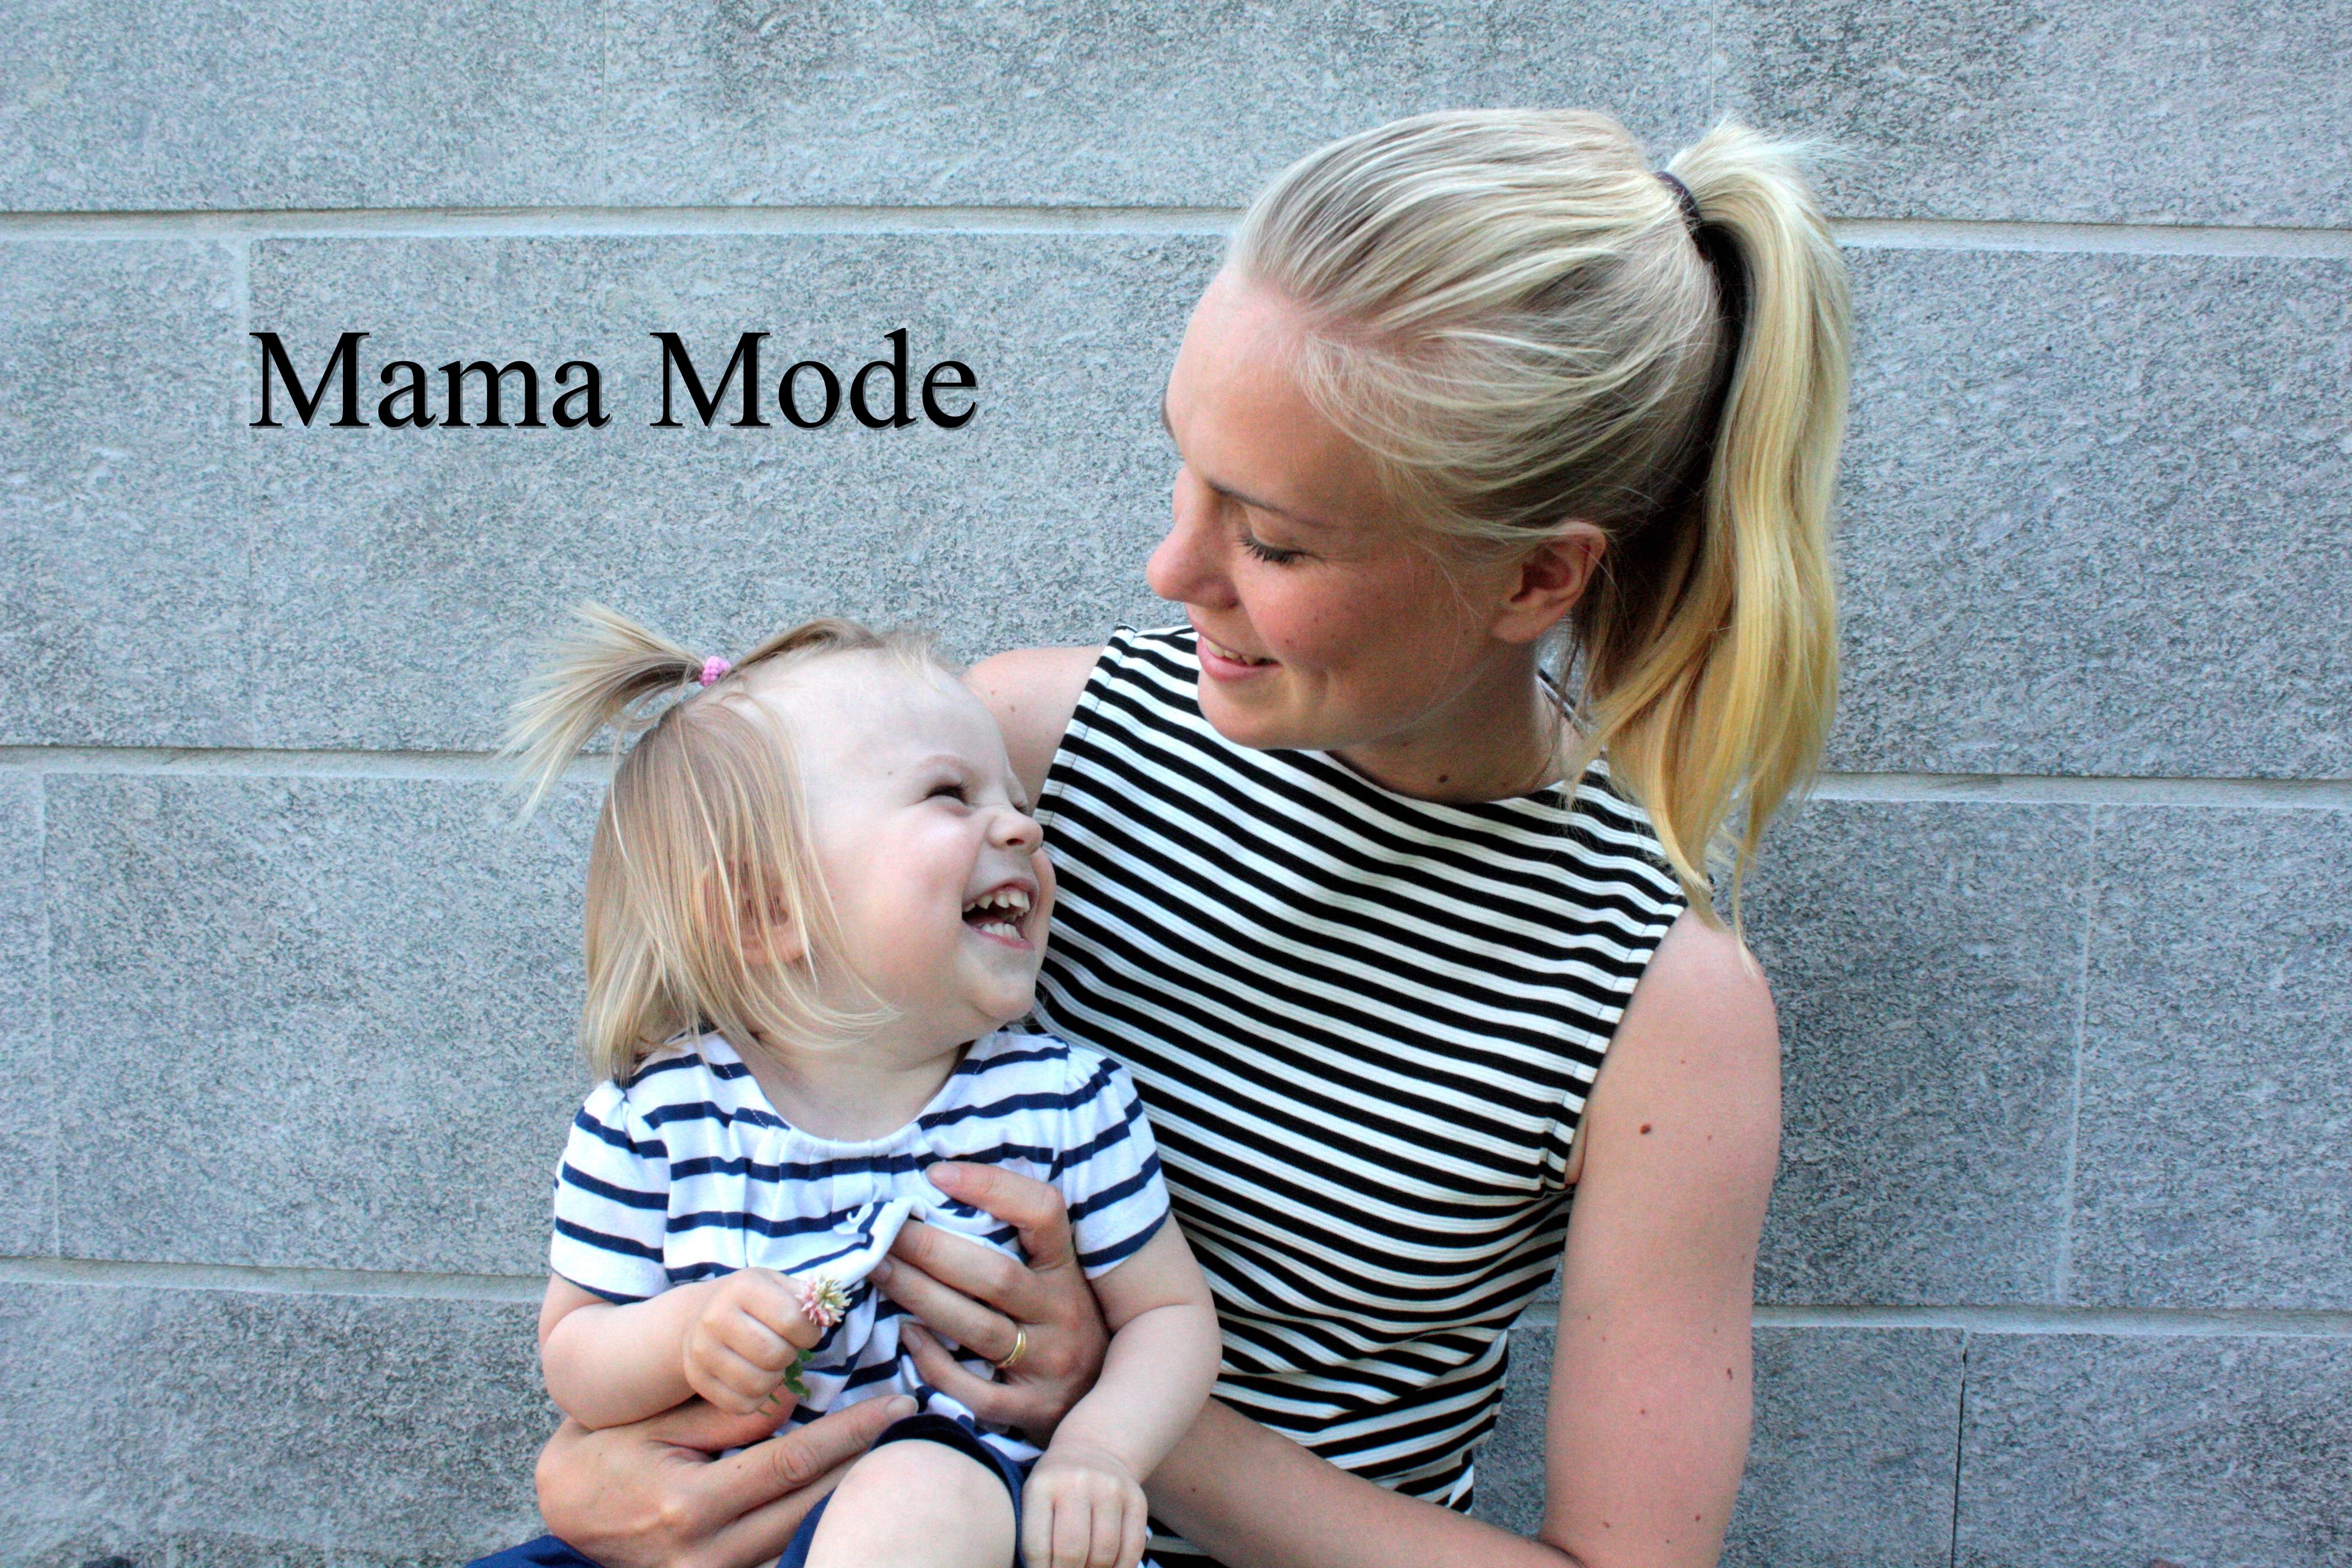 Mama Mode